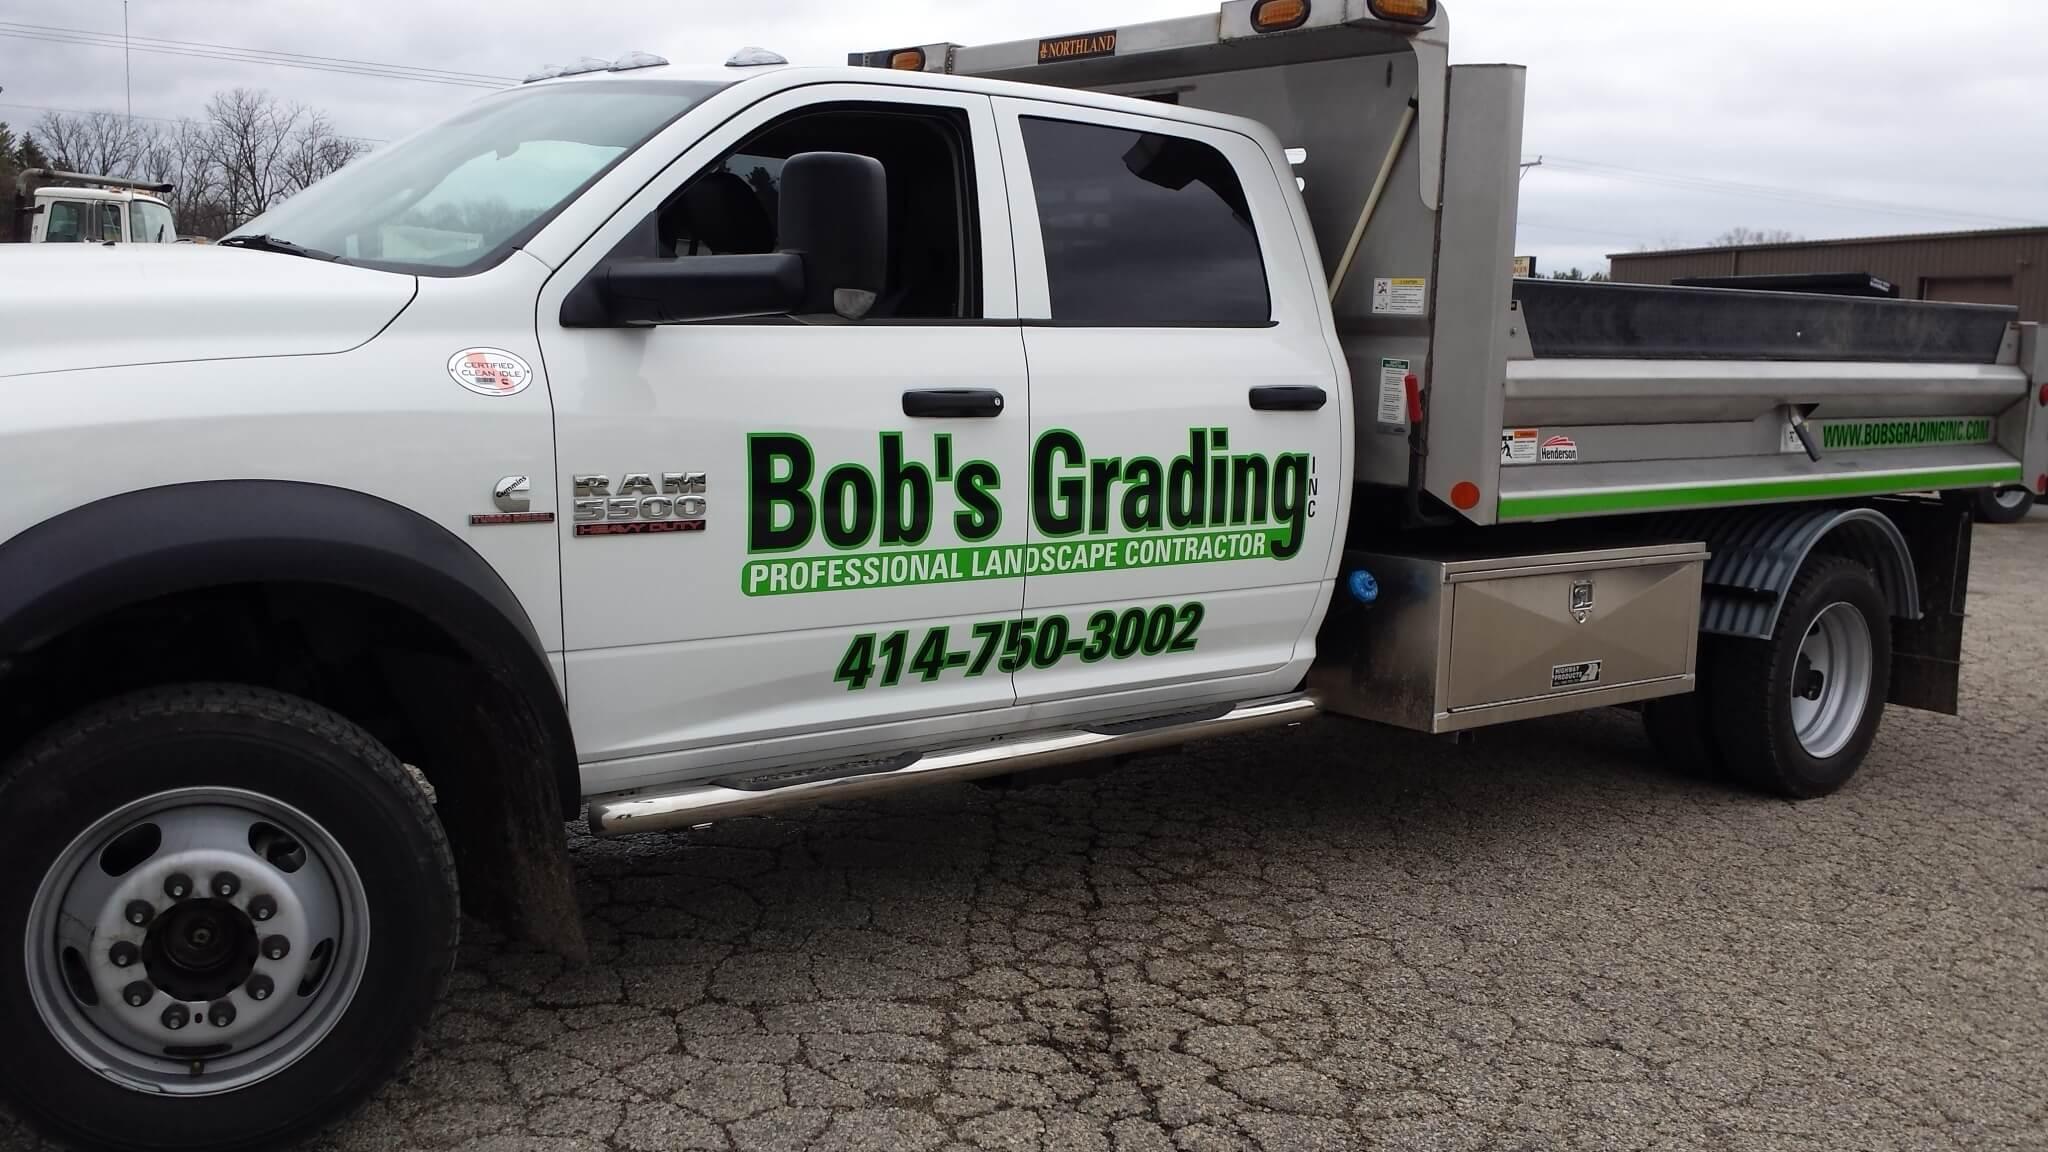 Bob's Grading Service Truck Graphics